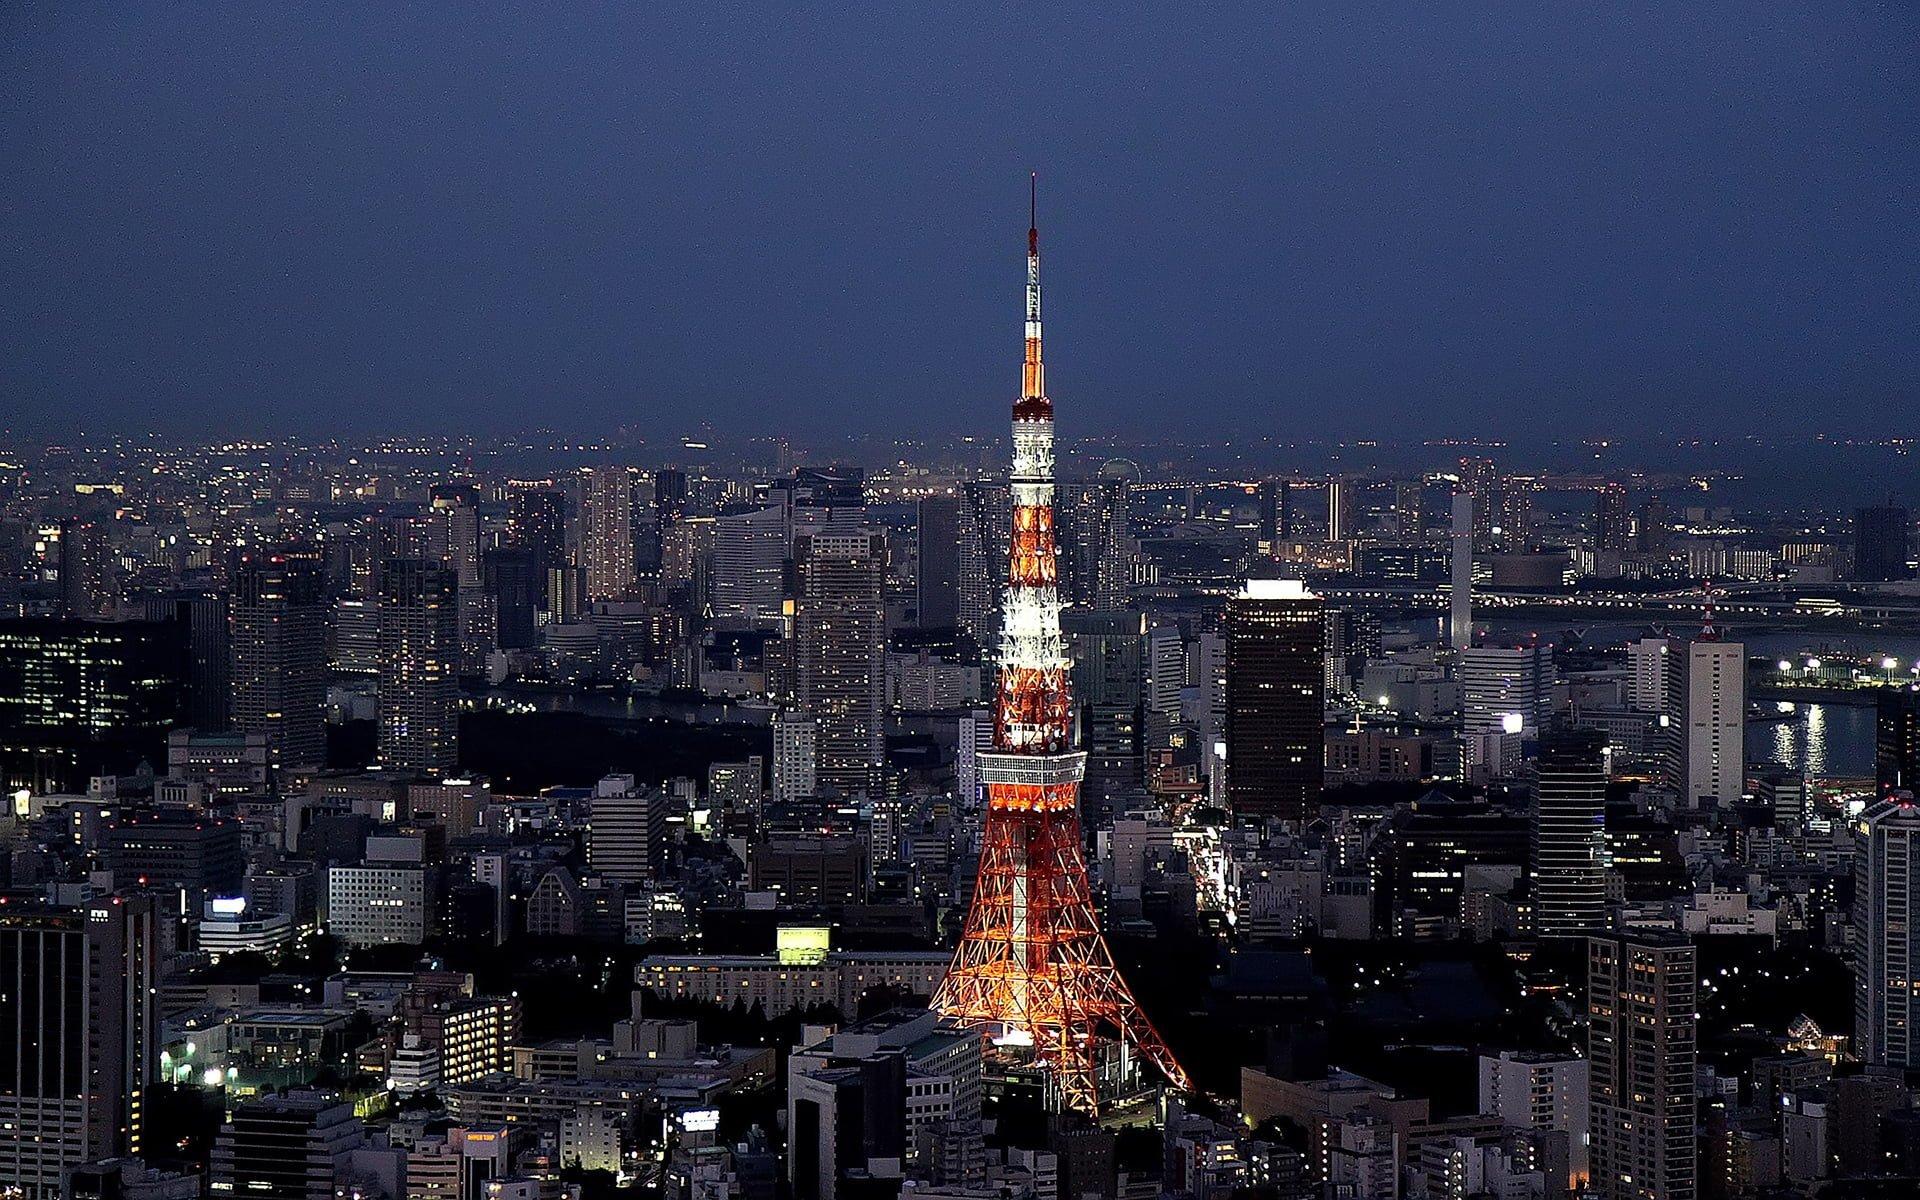 japonya kule